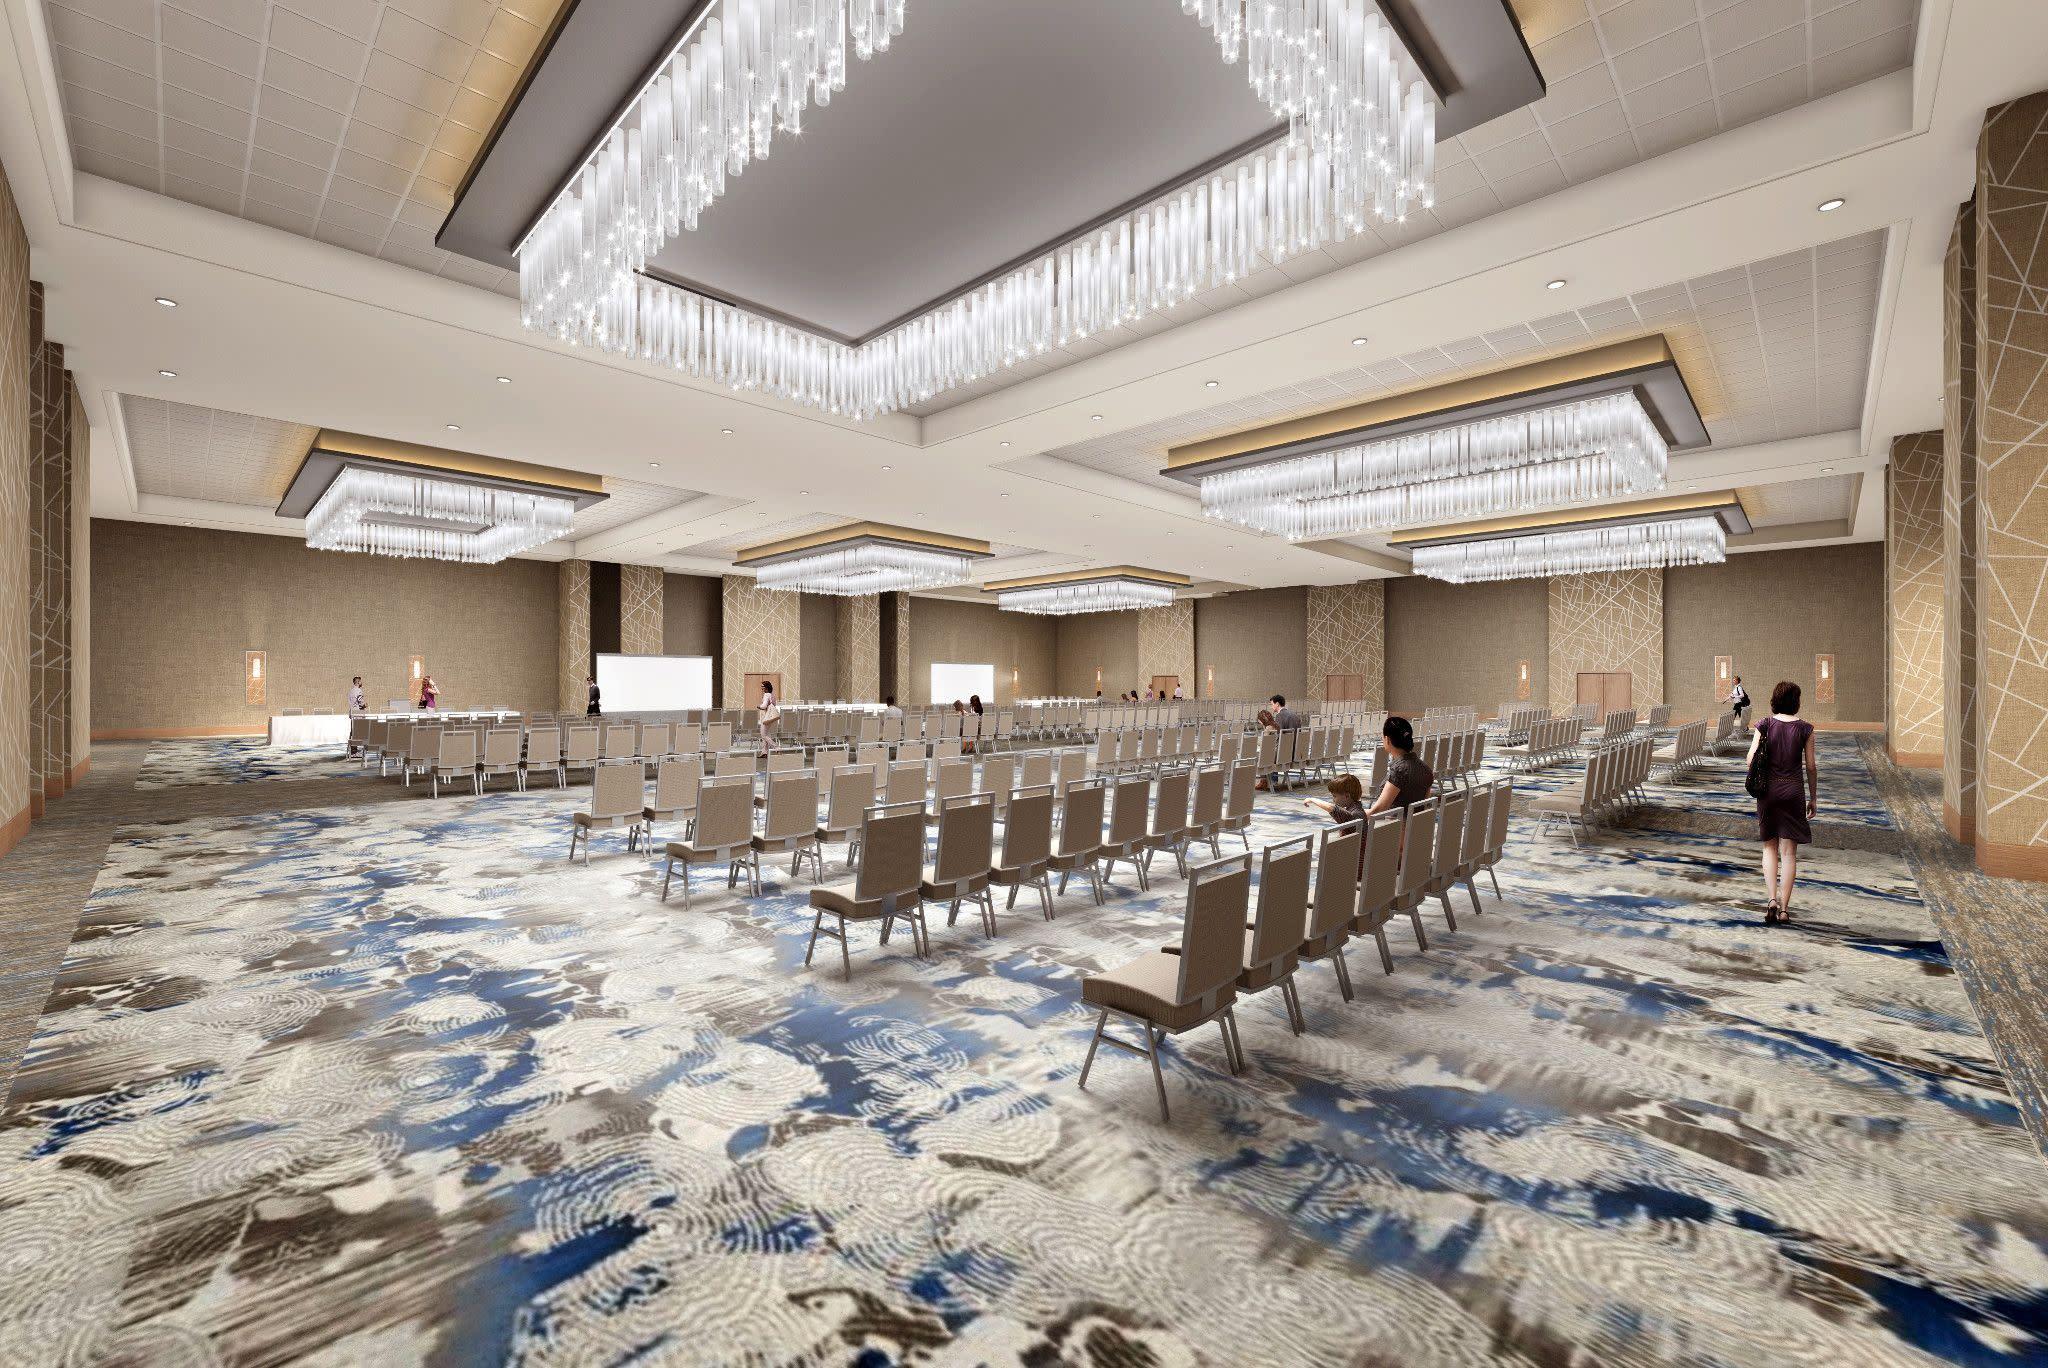 Majestic Ballroom at DoubleTree by Hilton Orlando at SeaWorld